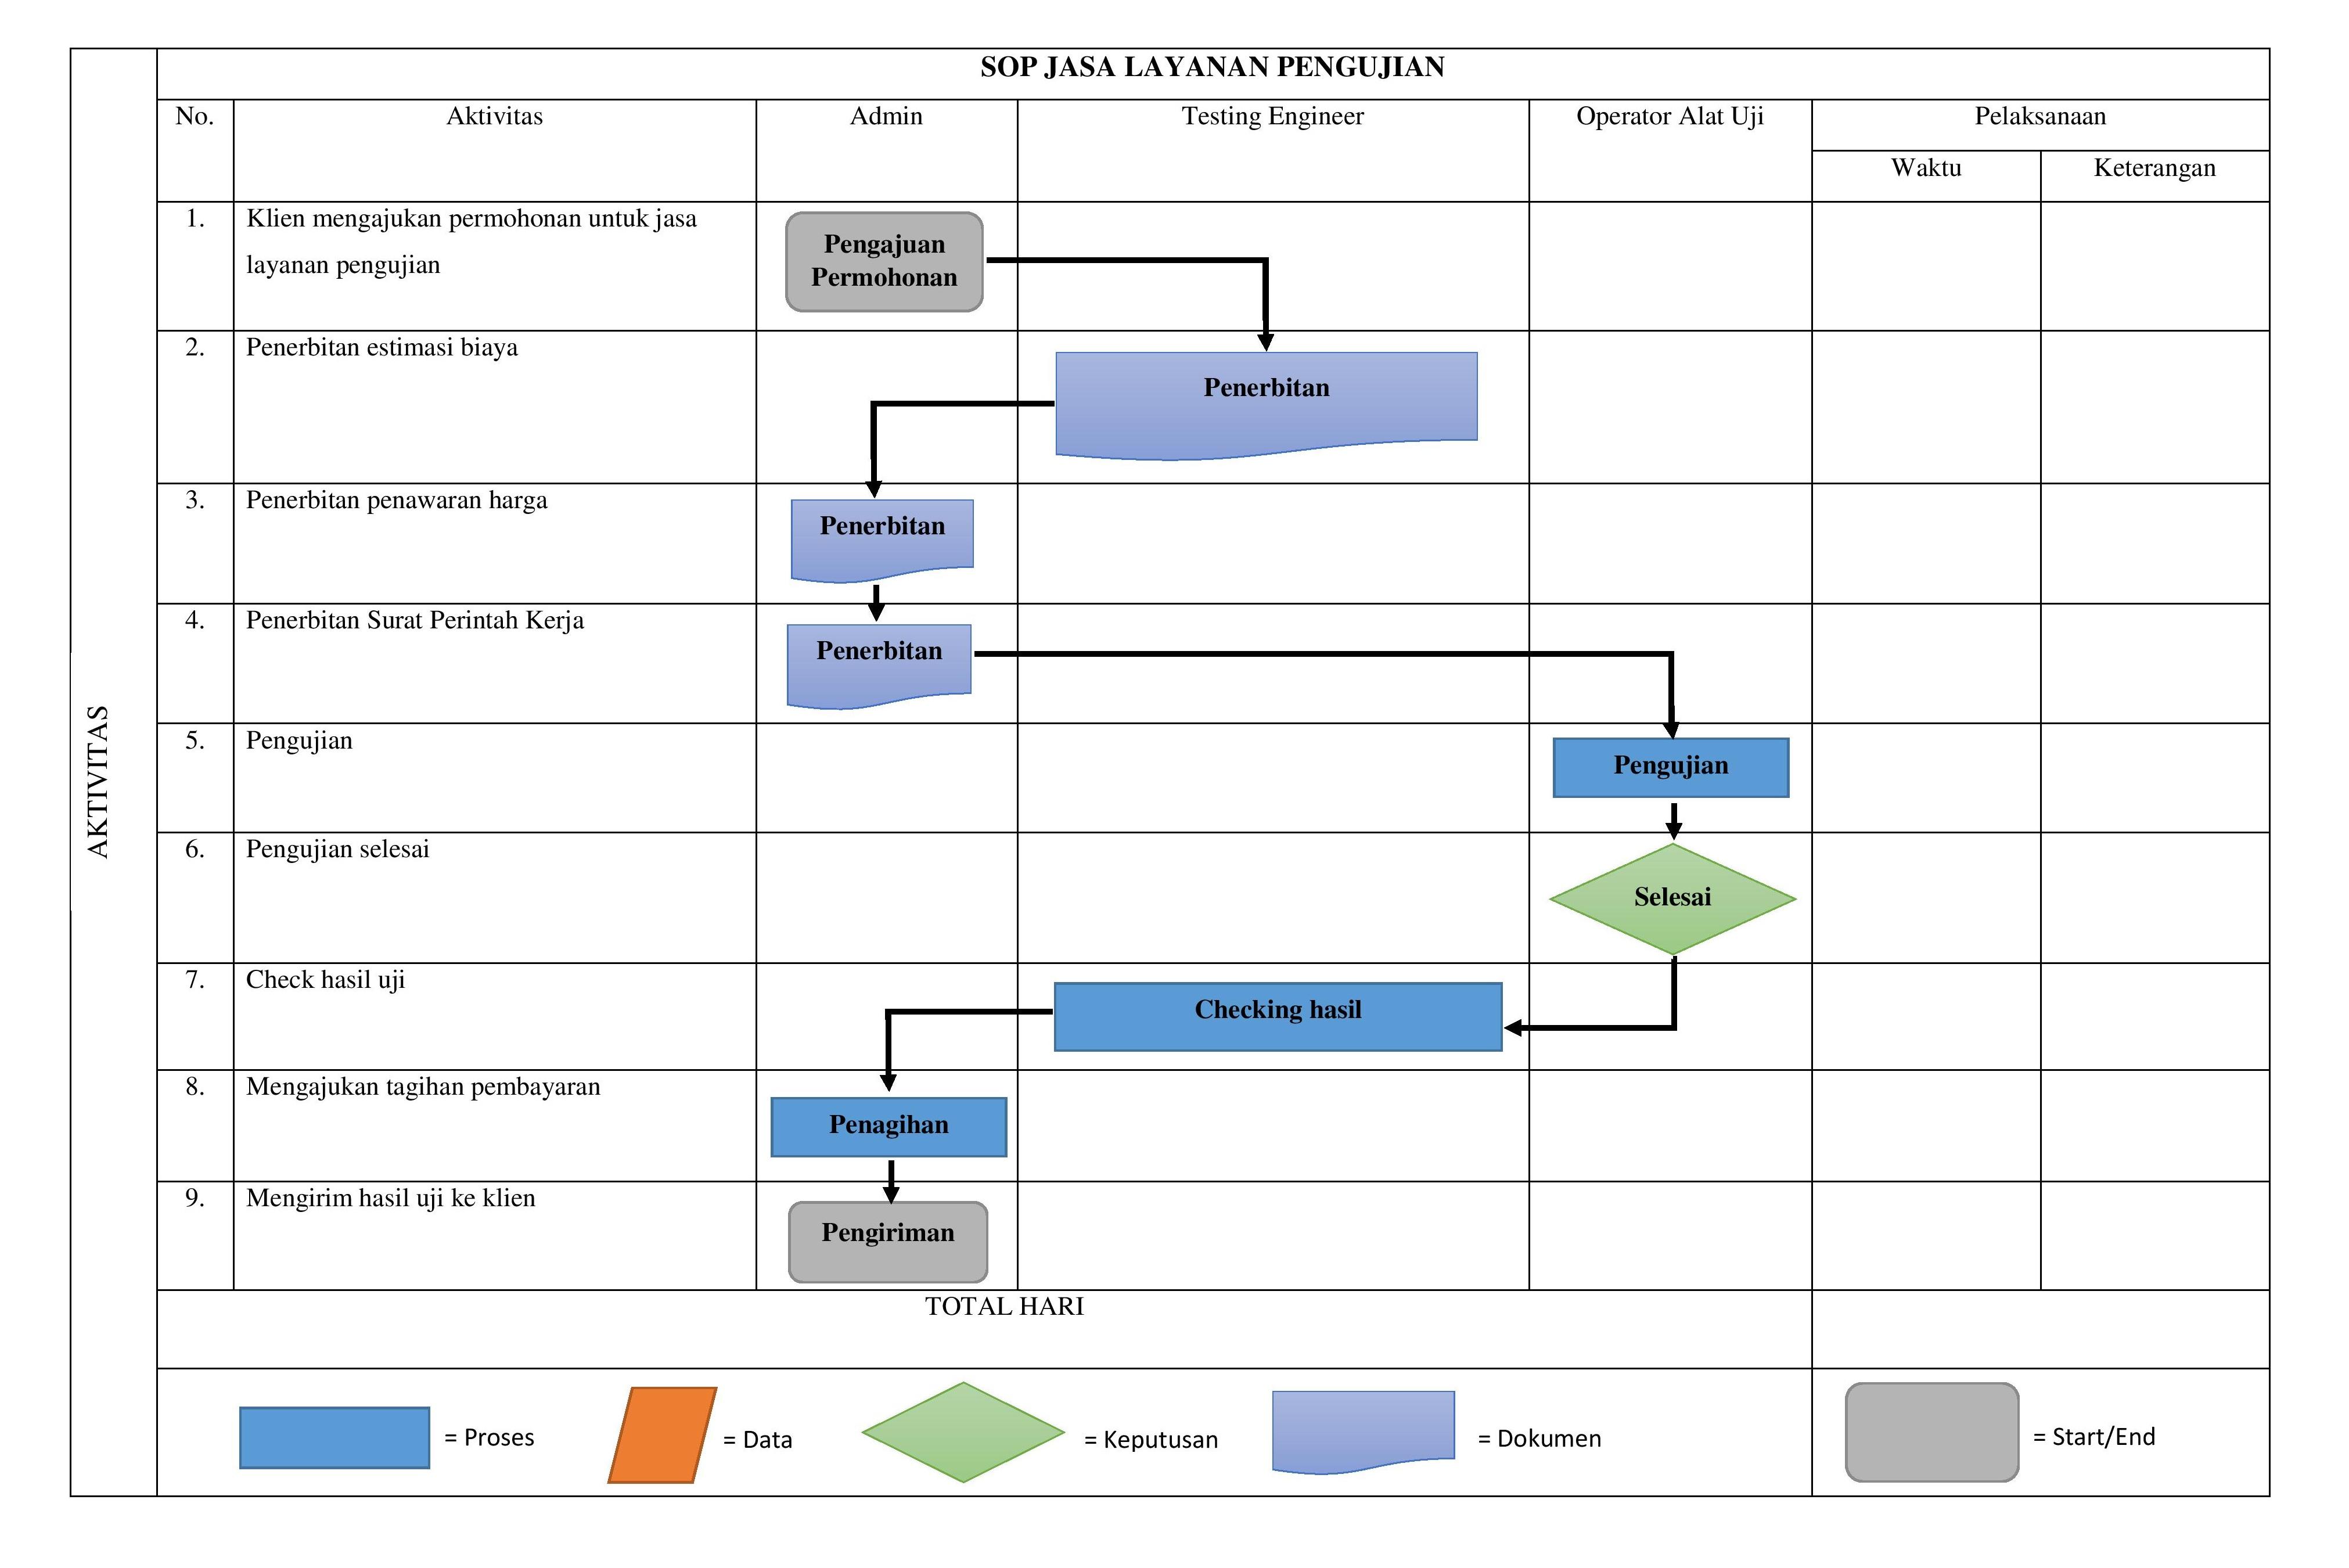 SOP JASA LAYANAN PENGUJIAN Revised-page-001